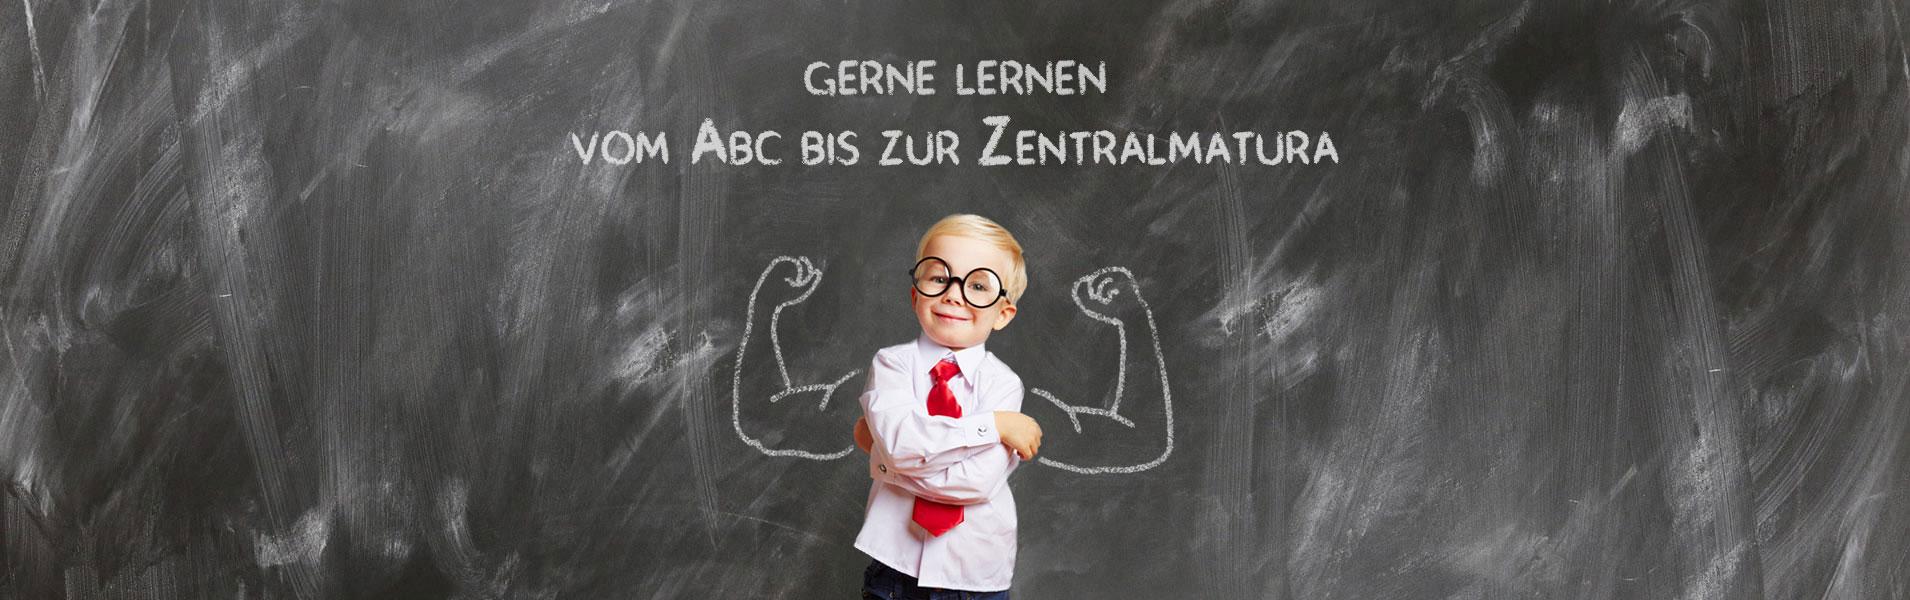 Lernwerkstatt-Linz-Nachhilfe